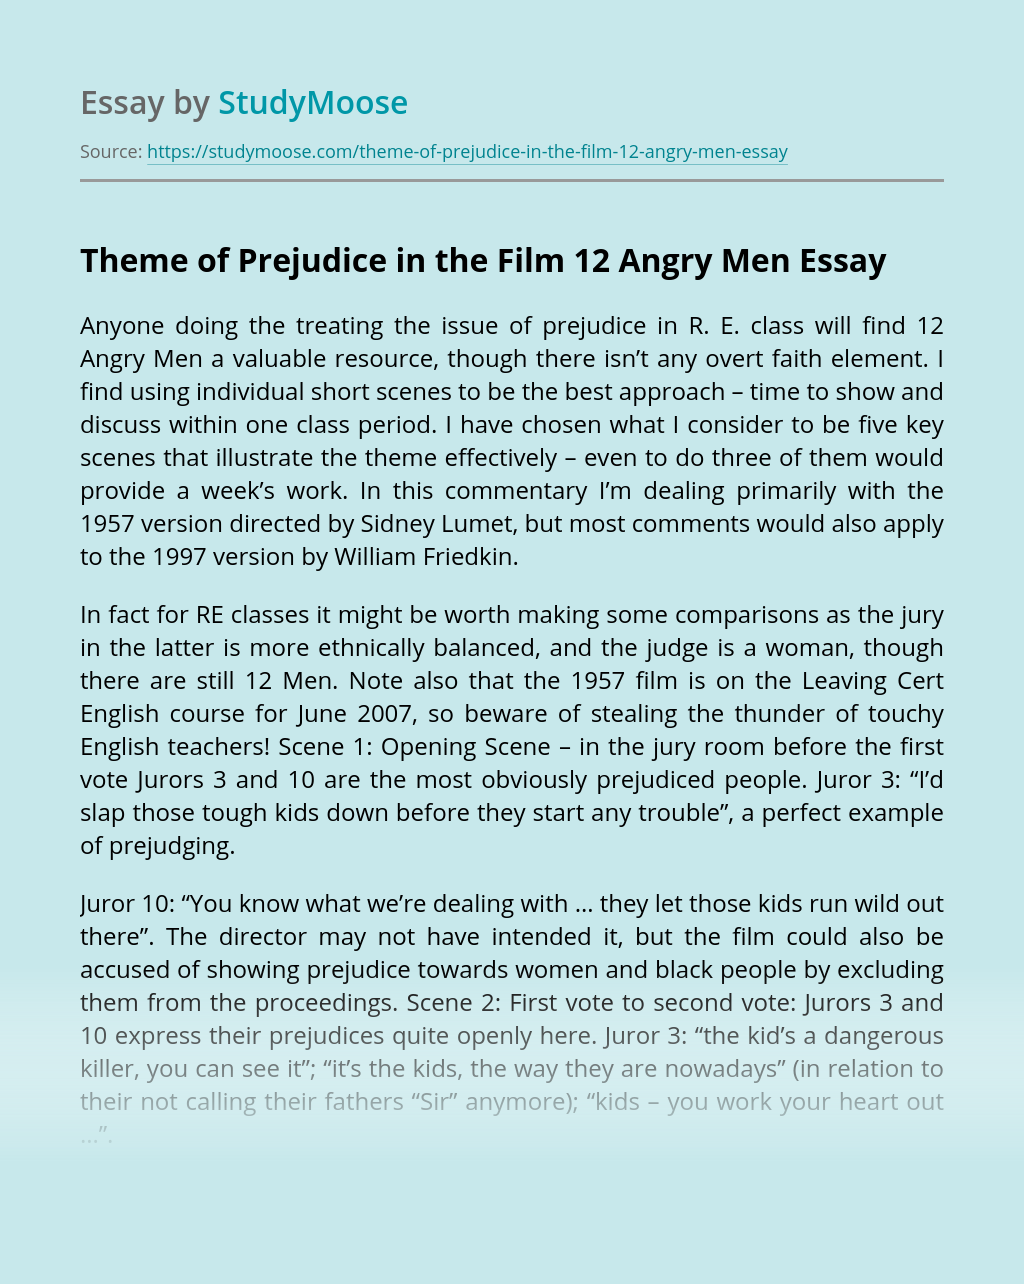 Theme of Prejudice in the Film 12 Angry Men